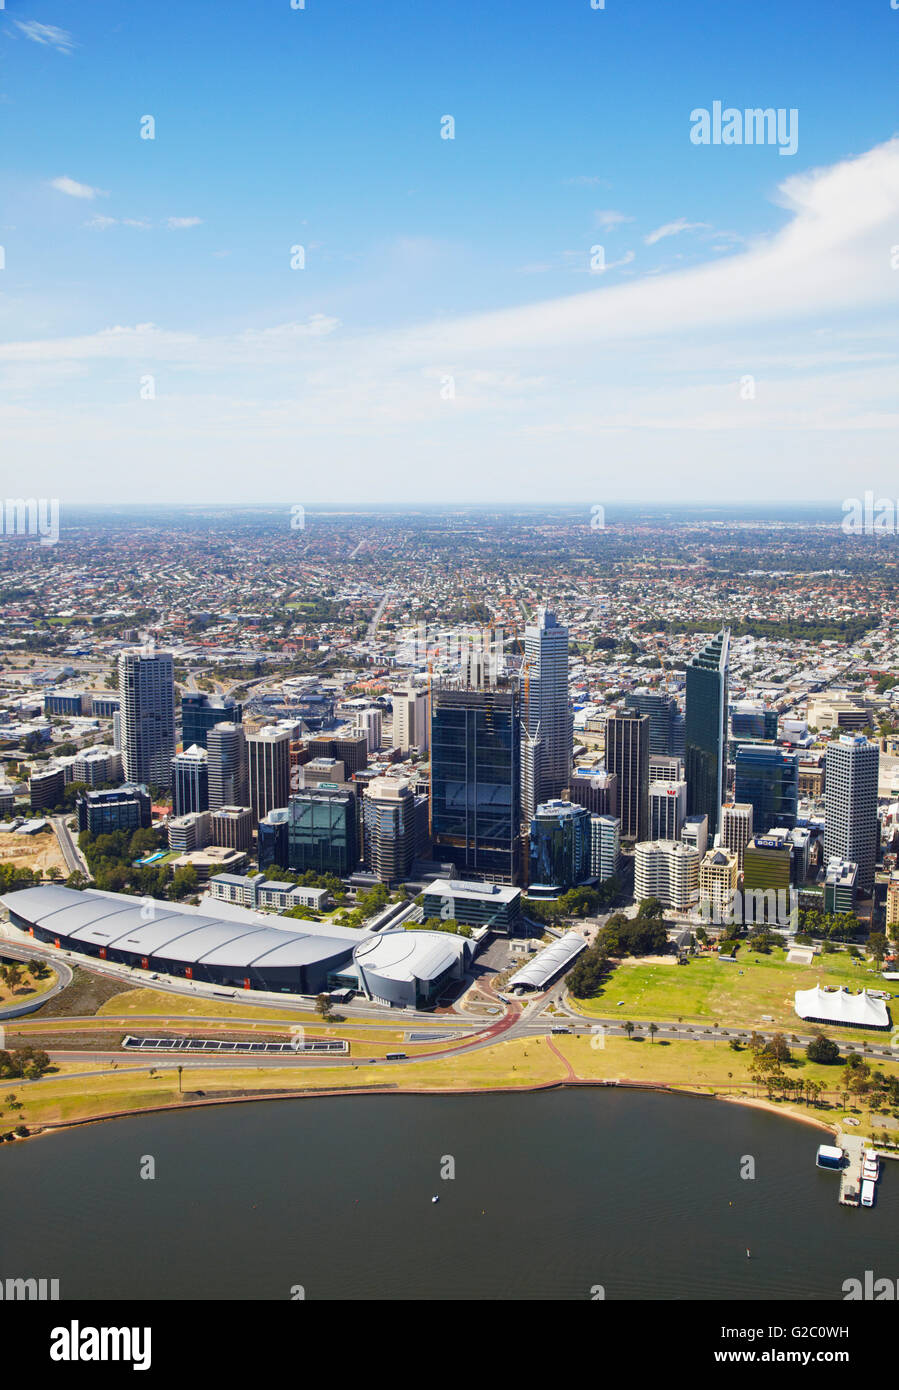 Aerial view of downtown Perth, Western Australia, Australia - Stock Image